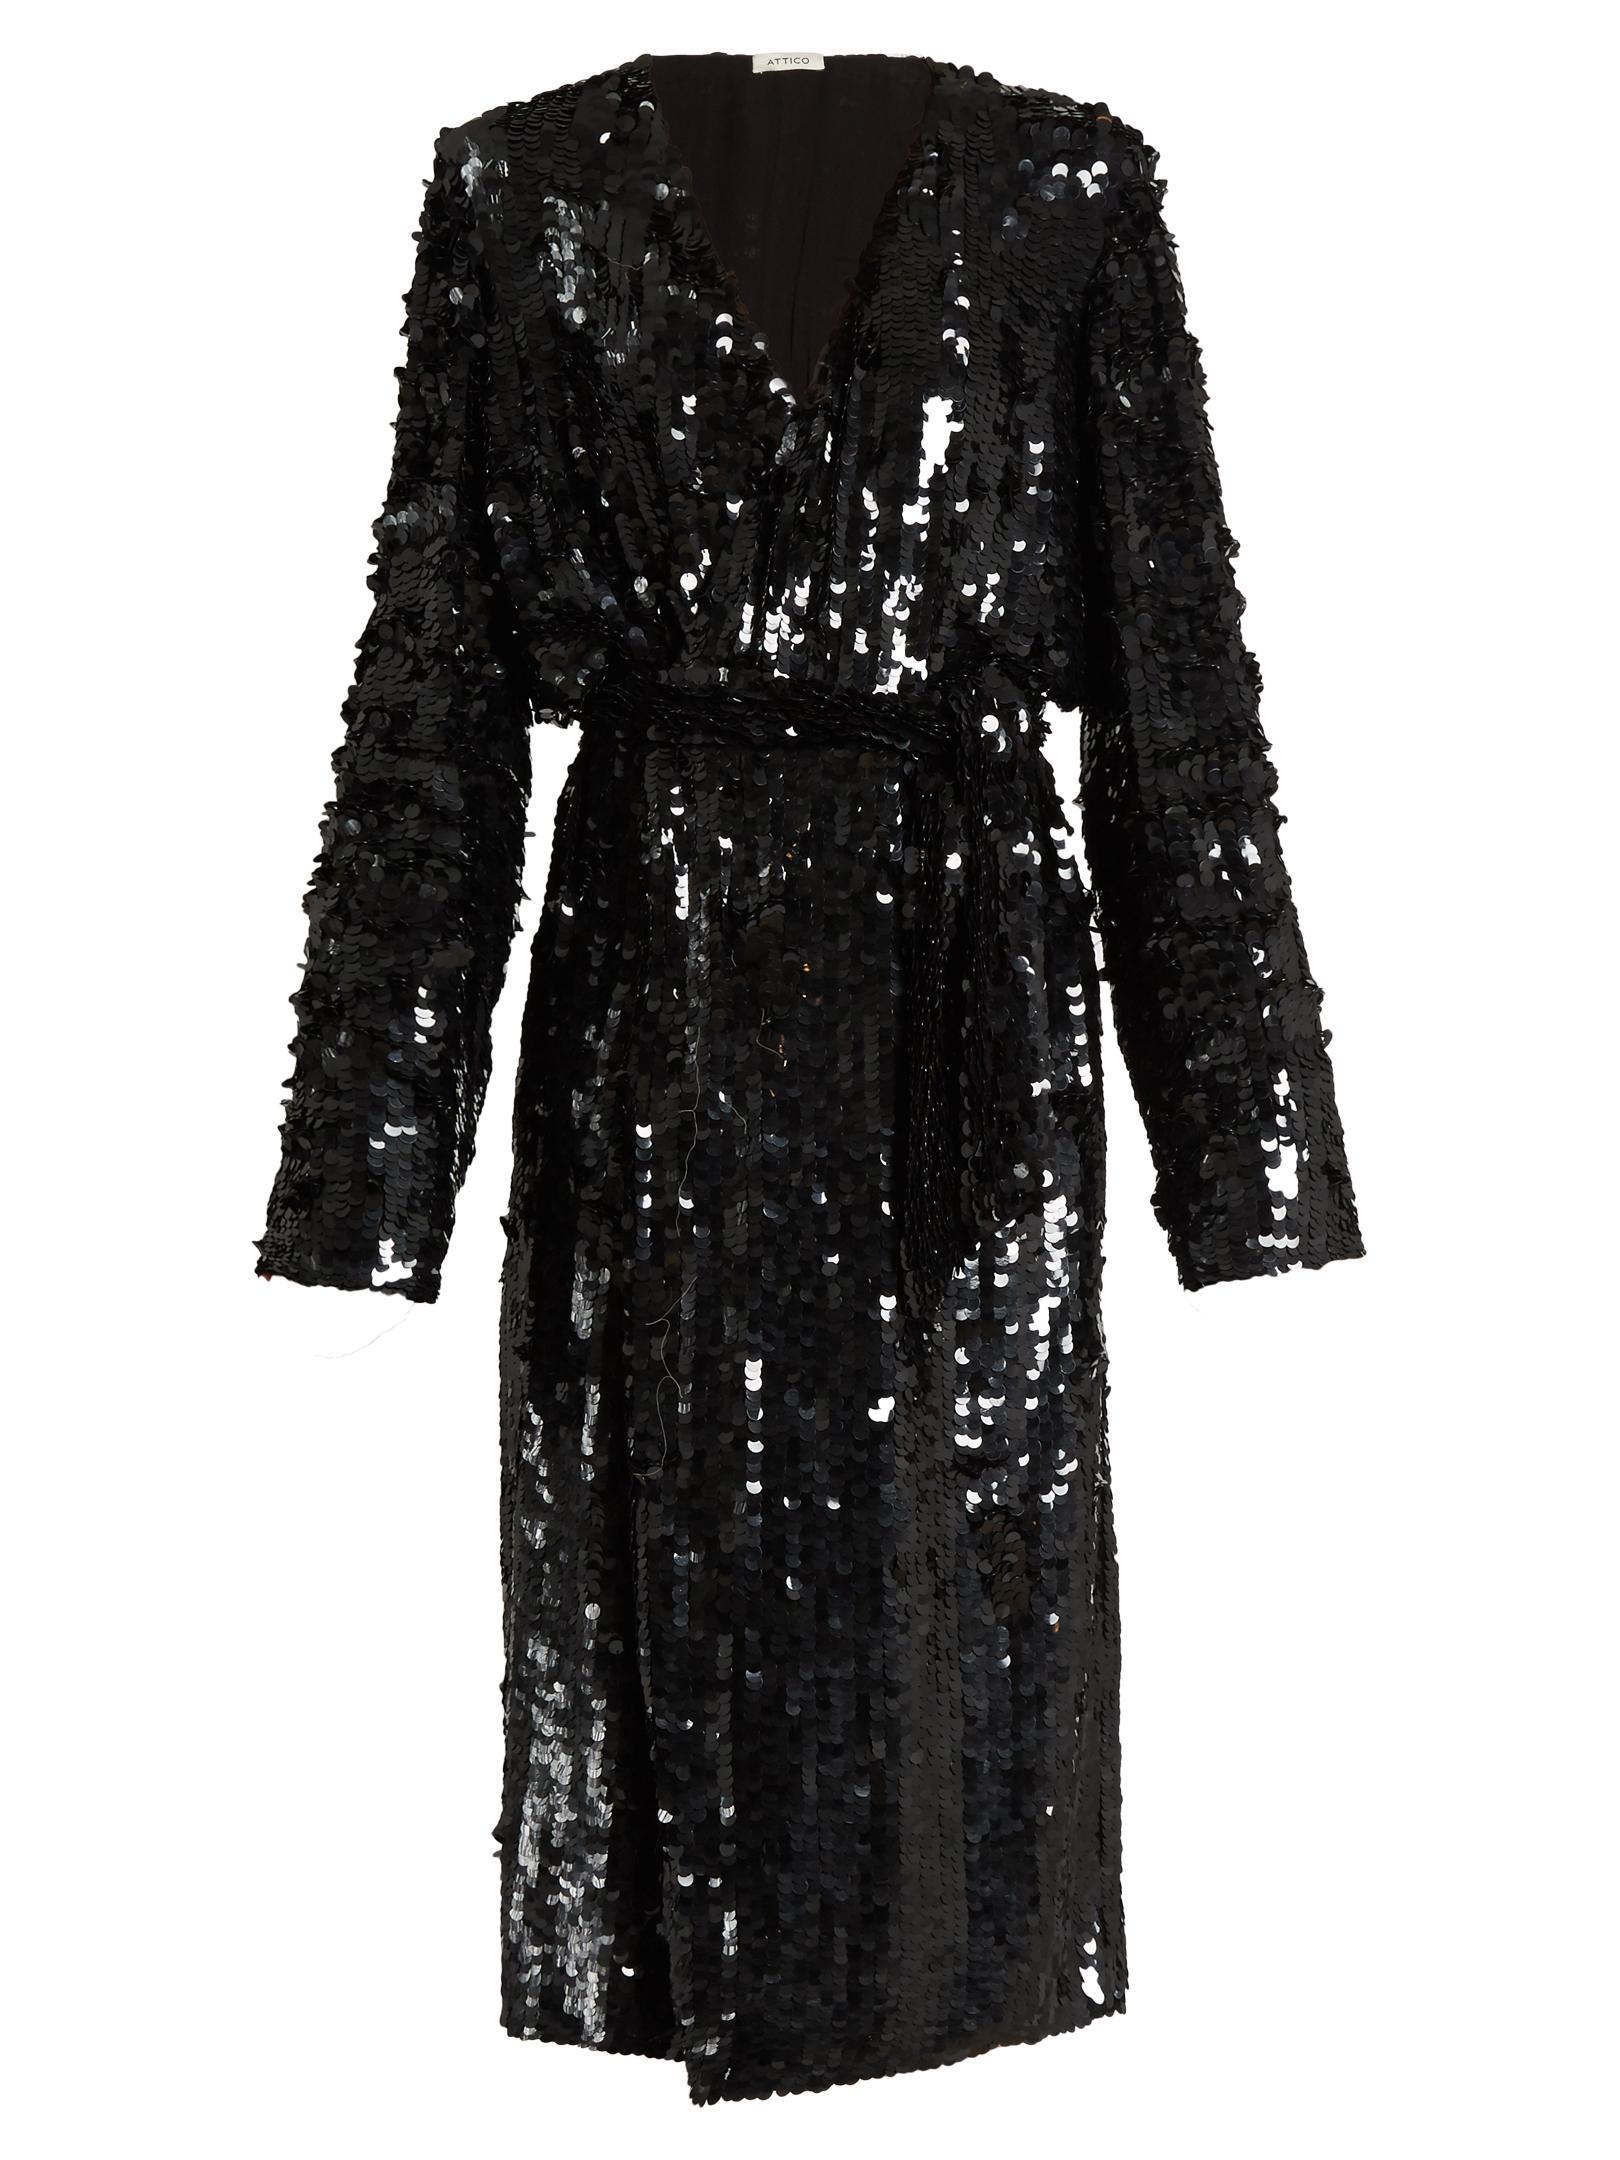 Attico Dara Sequin Embellished Wrap Dress In Black Lyst